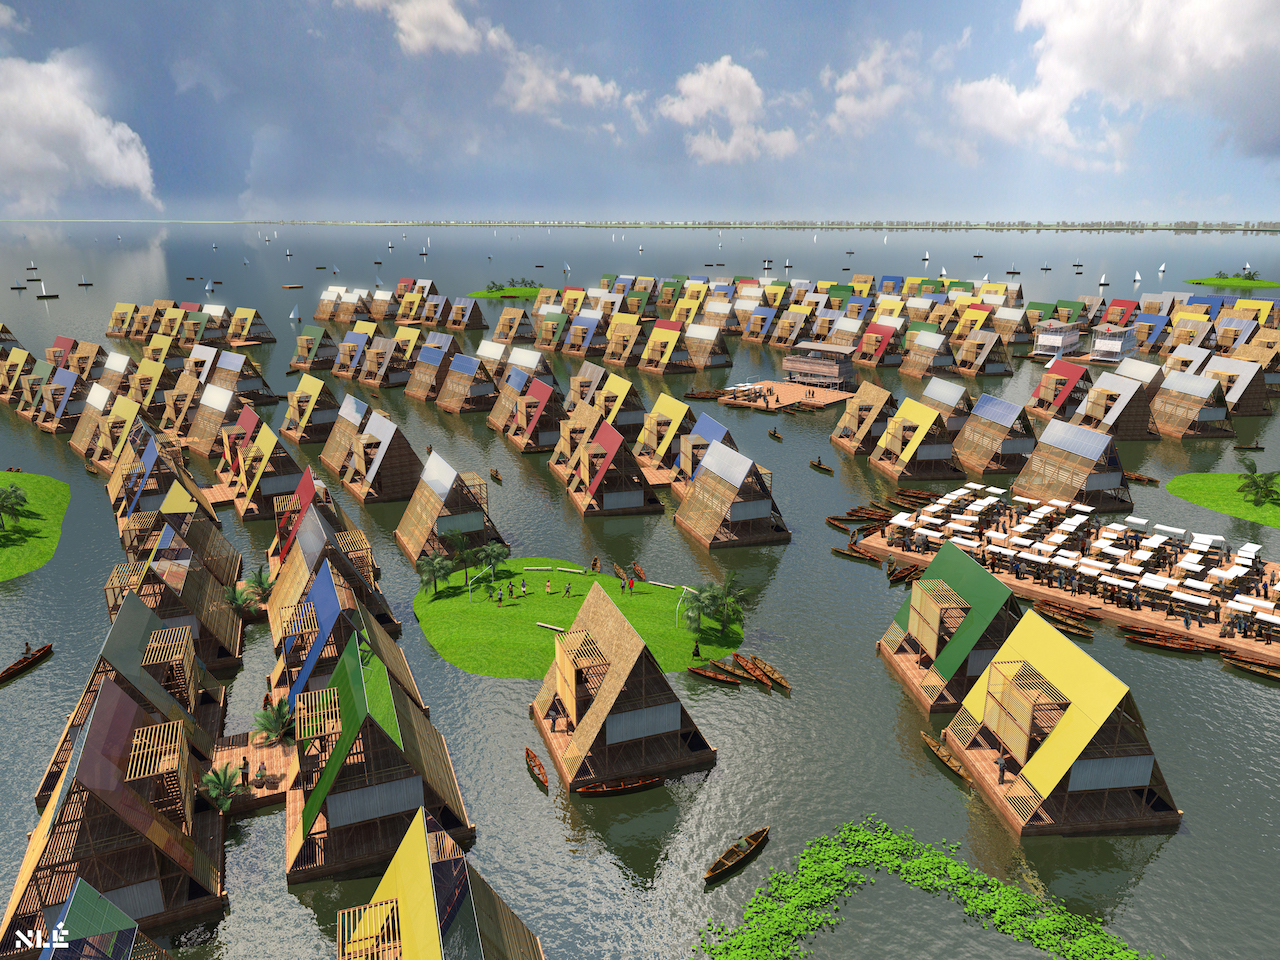 Design for water communities, Lagos, Nigeria by NLÉ (c) NLÉ